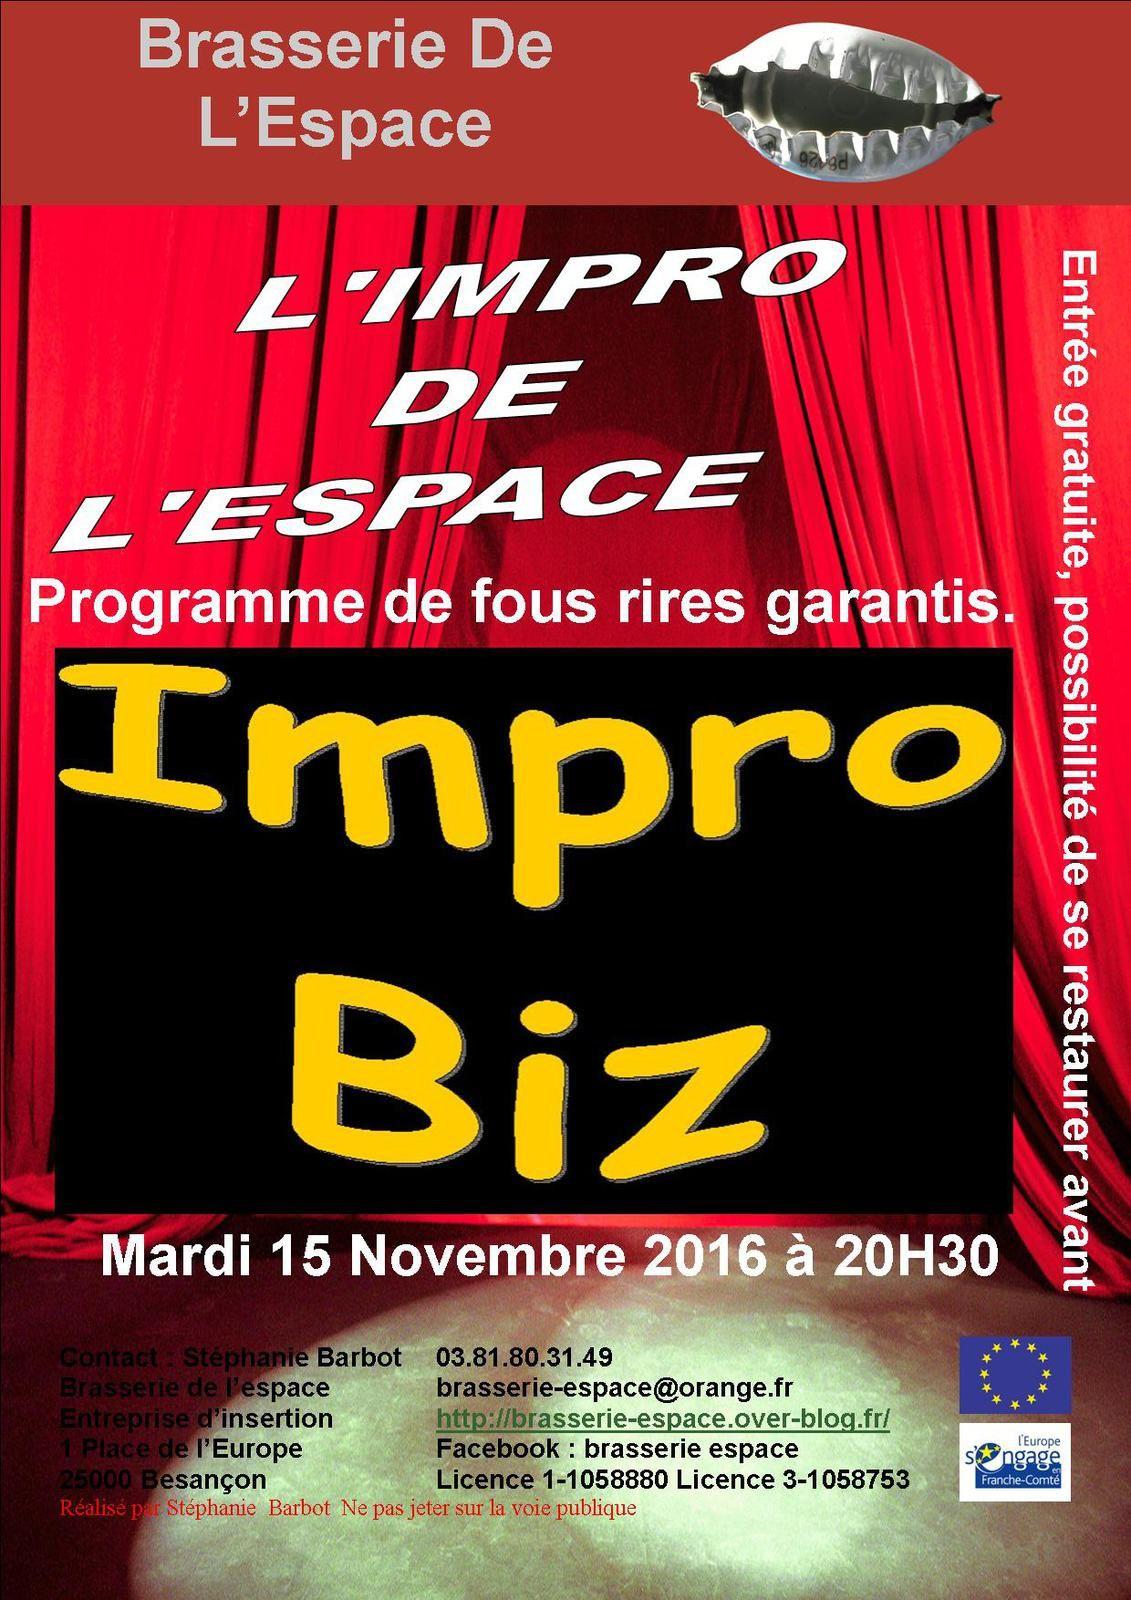 Théâtre d'Impro 20h30 mardi 15 novembre 2016